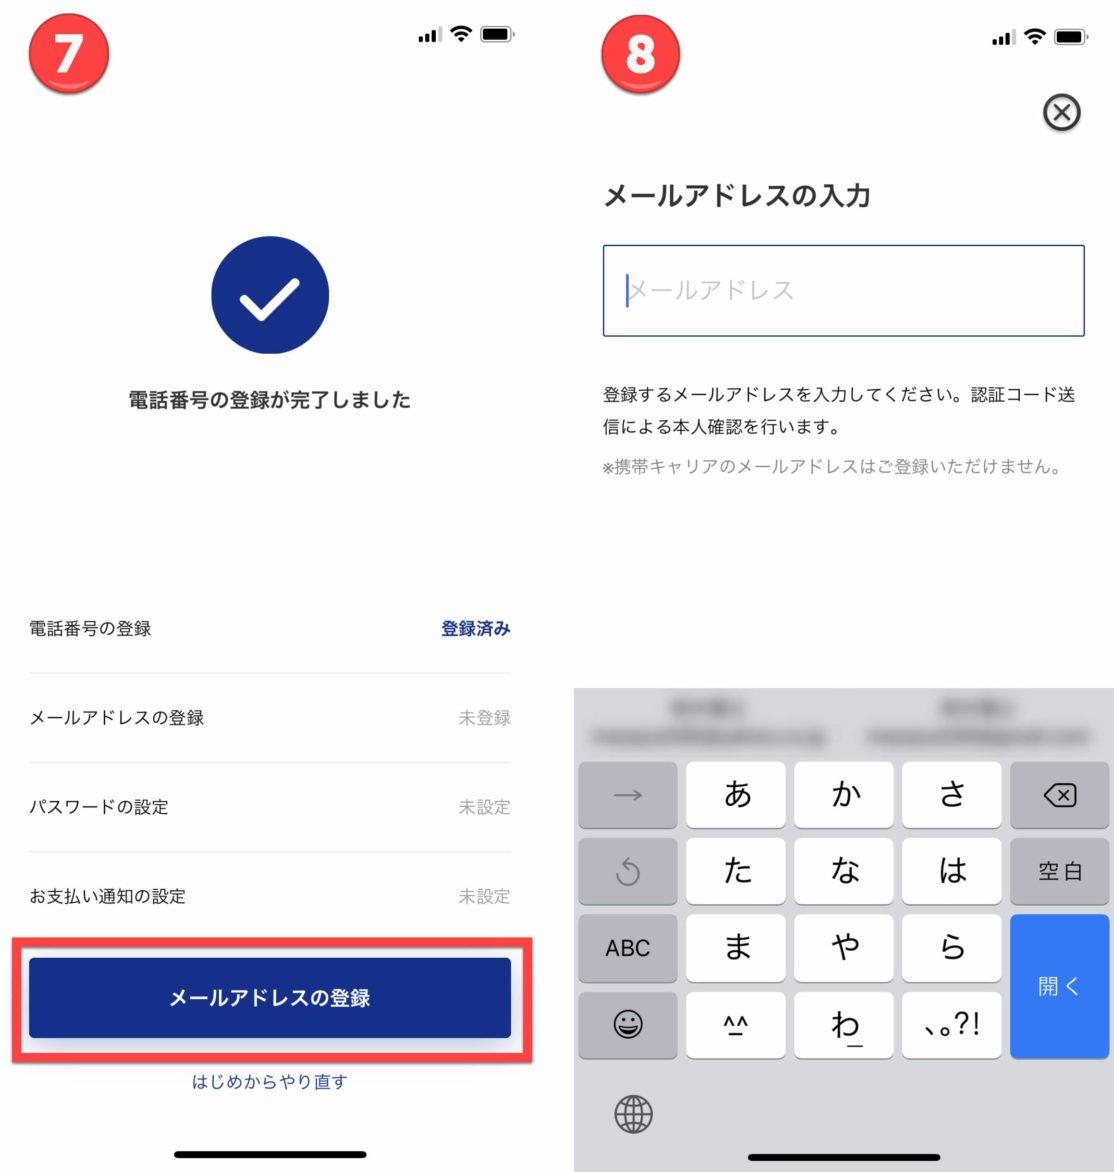 ANA Pay手順4